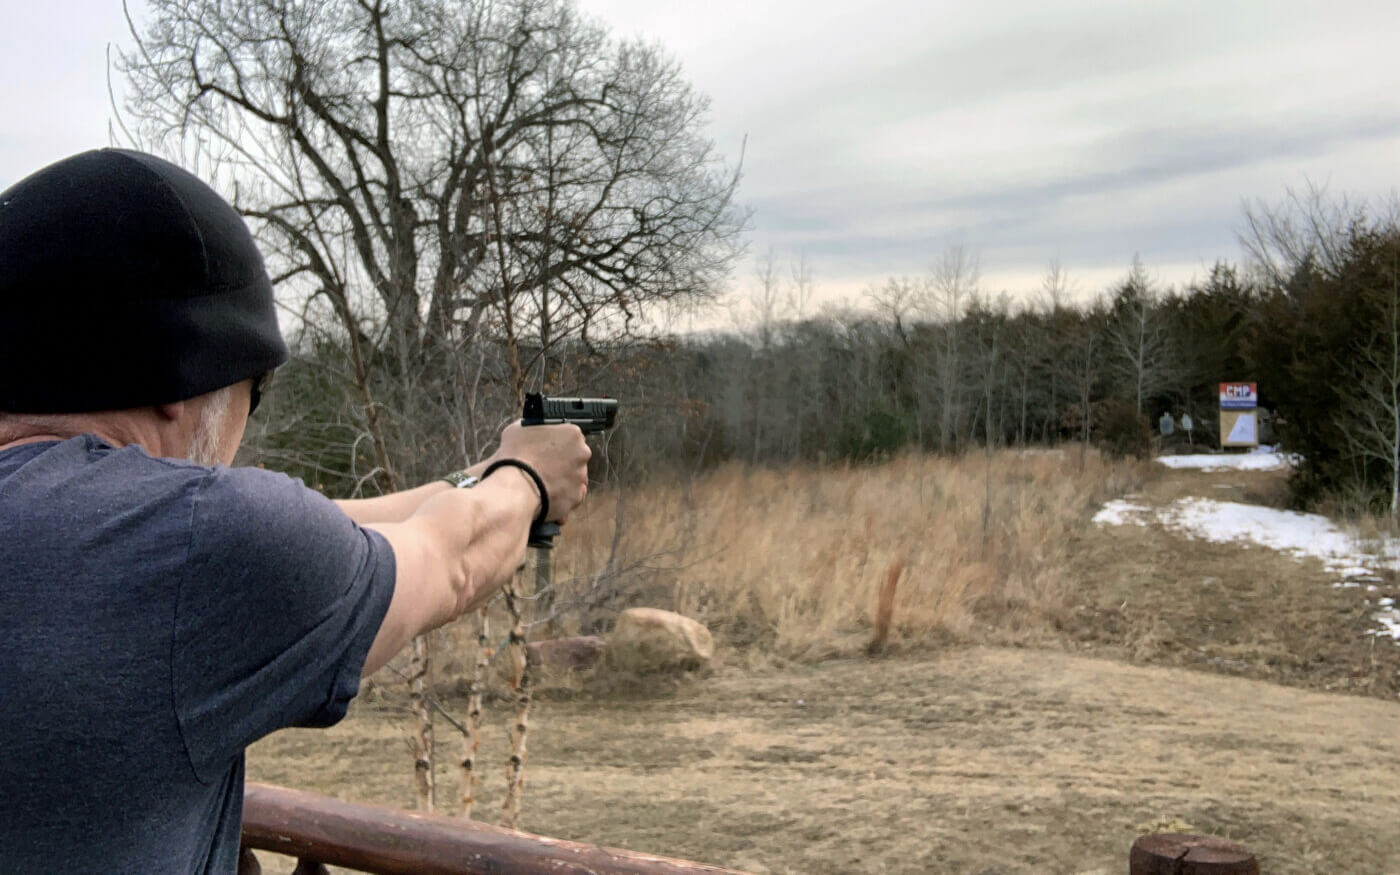 Shooting a handgun at 50 yards